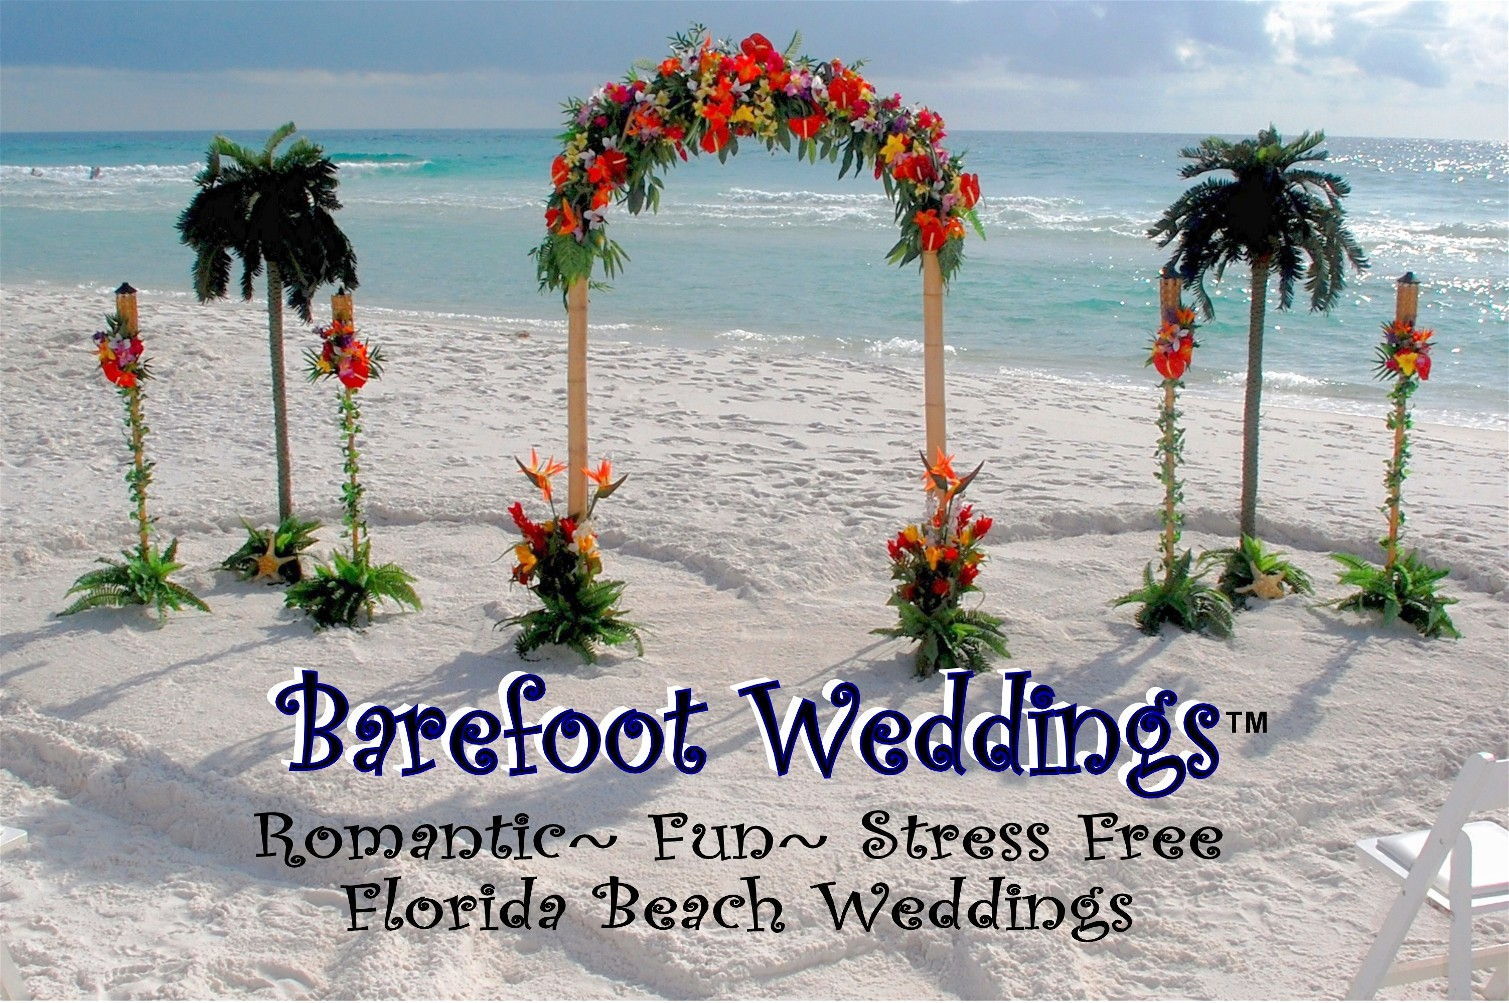 tropcal arch barefoot weddings ad Re: Solange at San Francisco's Gay Pride Parade   6/28